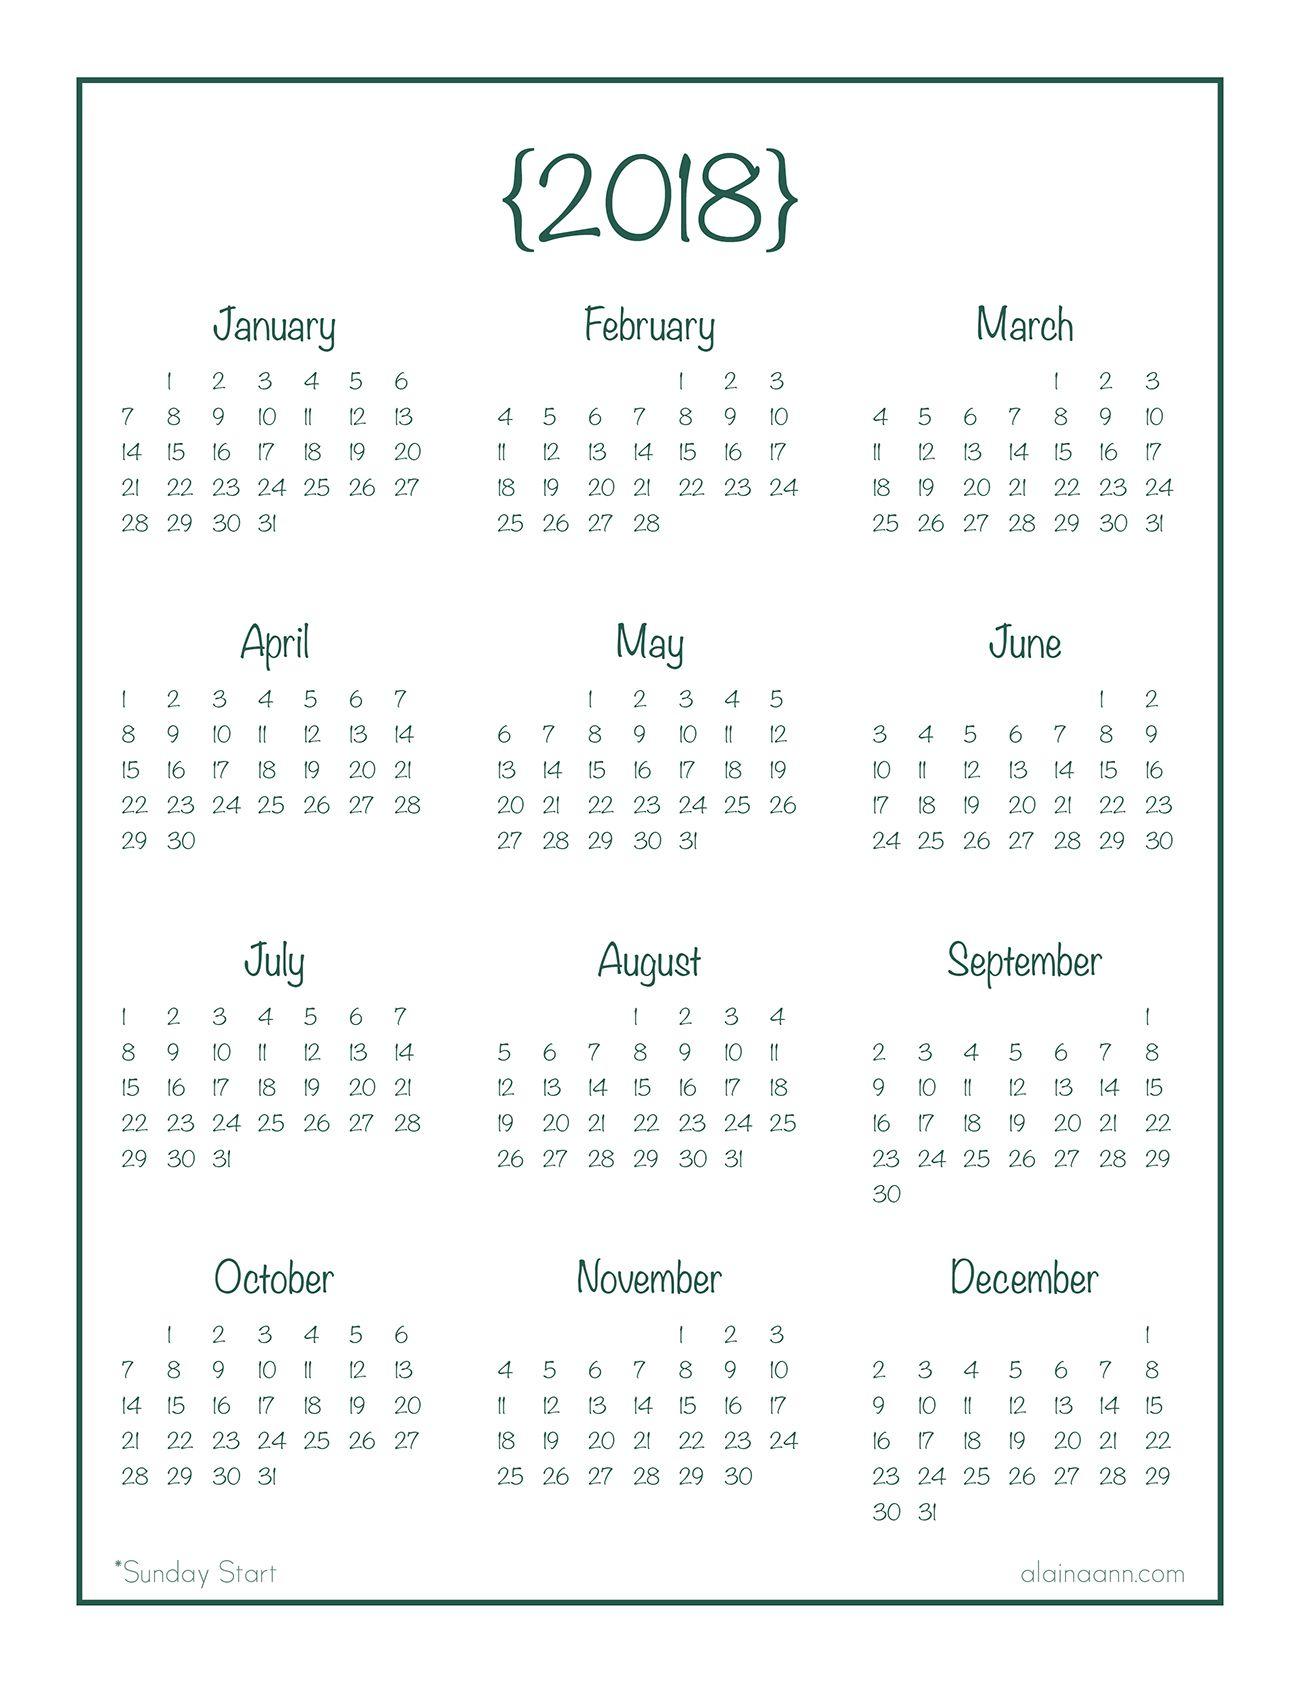 2018 Year-At-A-Glance Calendar {Free Printable} | Planner/journal regarding Calendar Template Year At A Glance